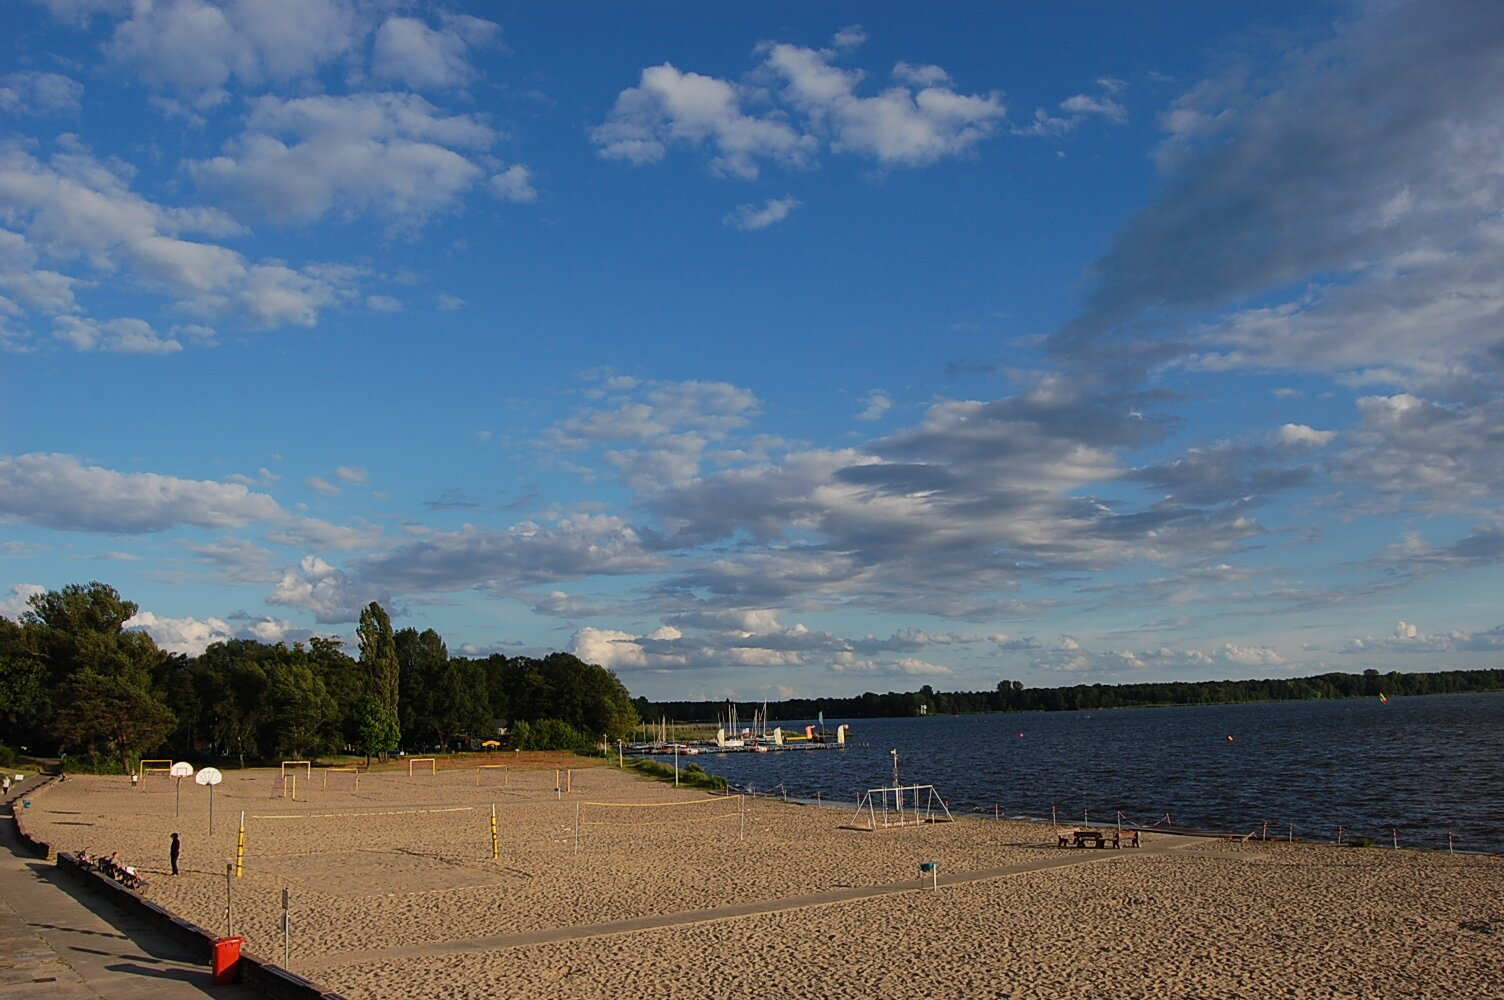 Strandbad mit Bootsverleih